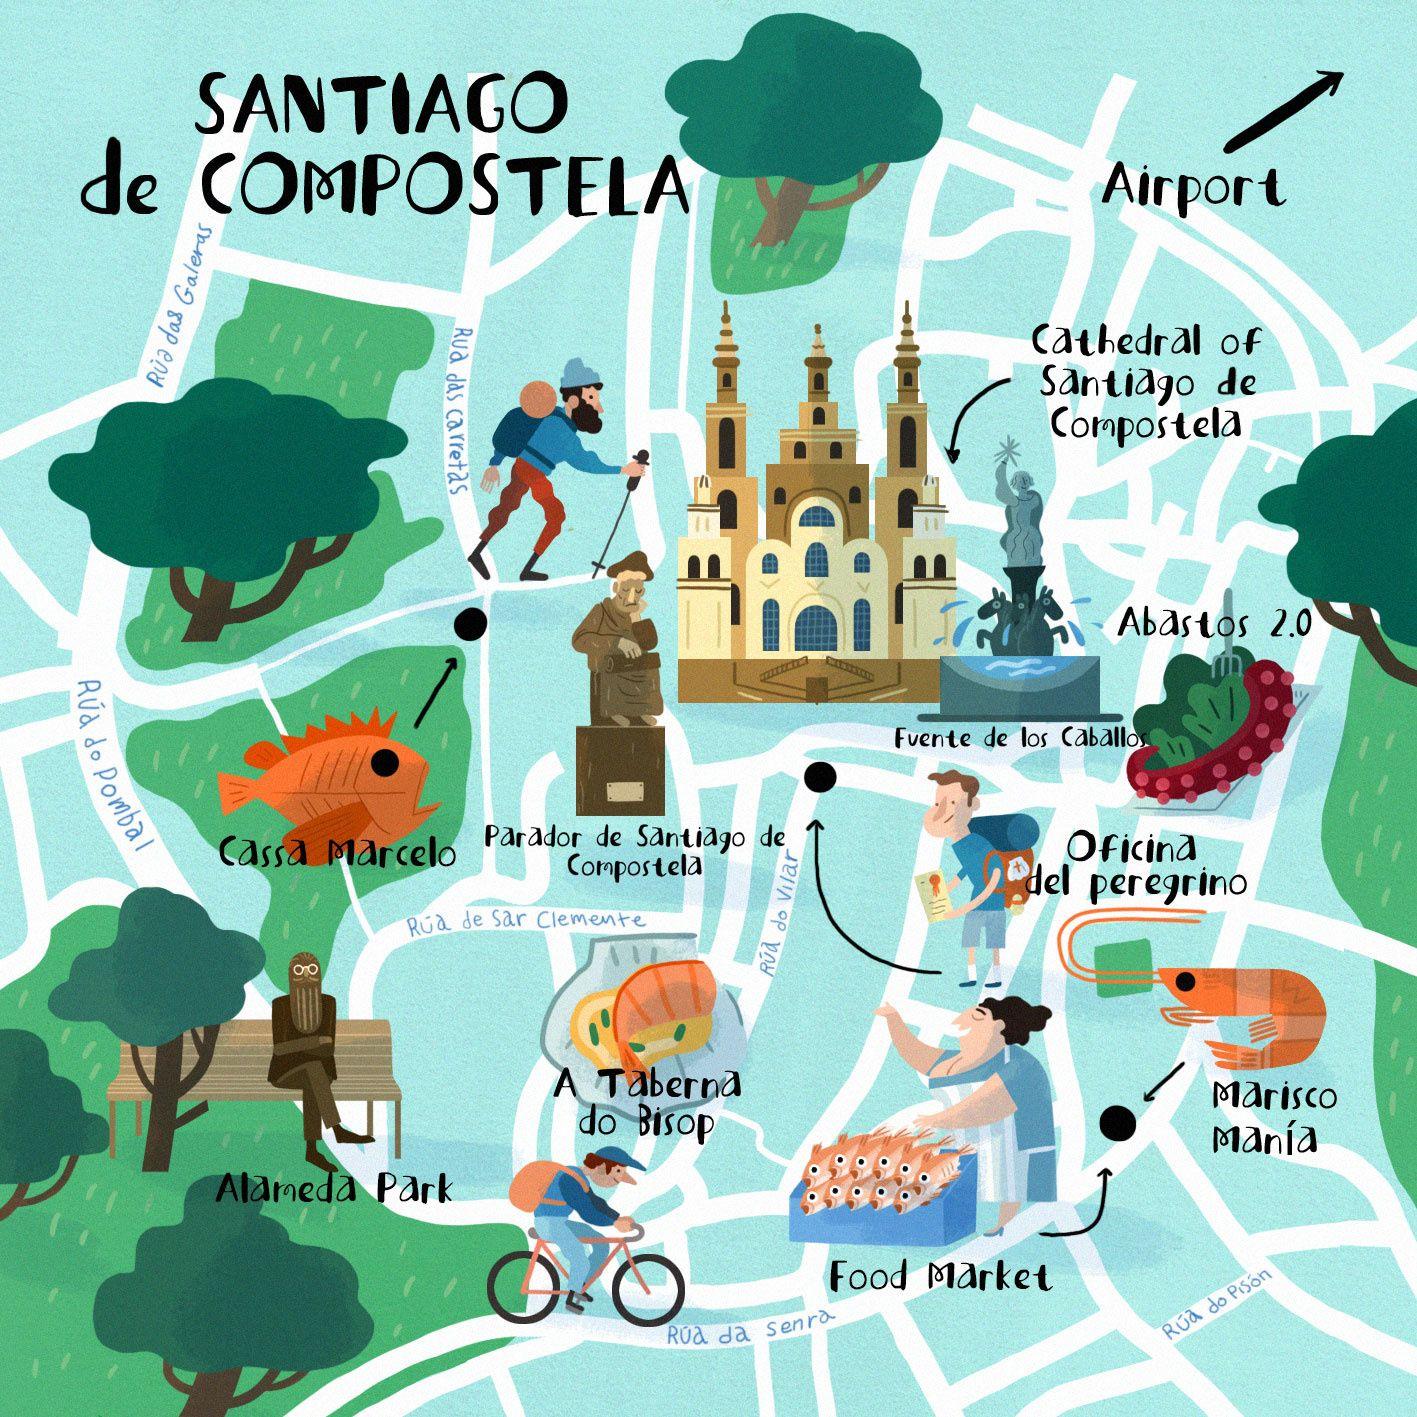 Callejero Mapa De Santiago De Compostela.Steve Mccarthy Map Of Santiago De Compostela Carte